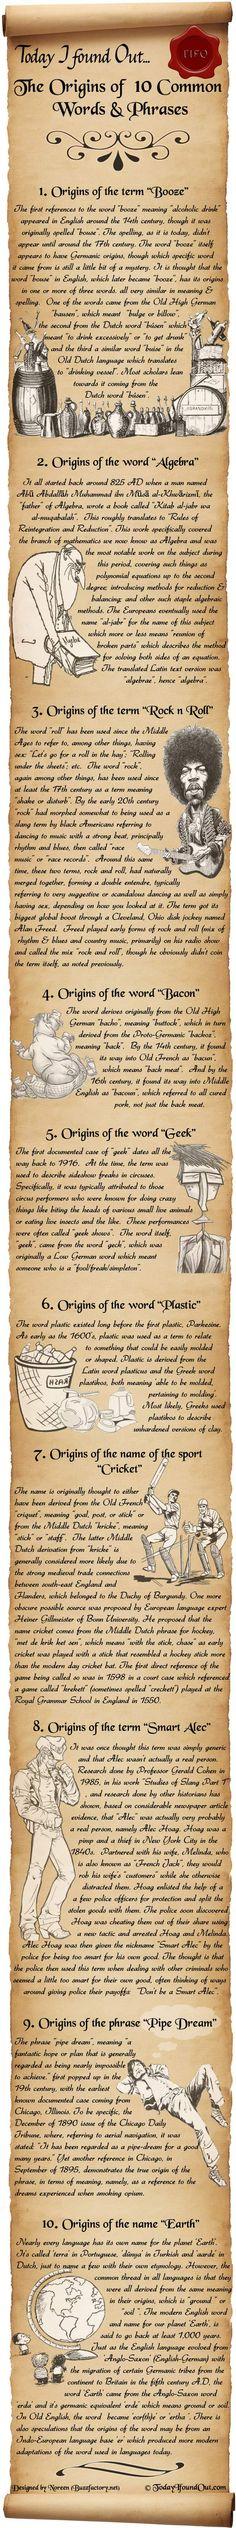 33 Commonly Misunderstood Words & Phrases